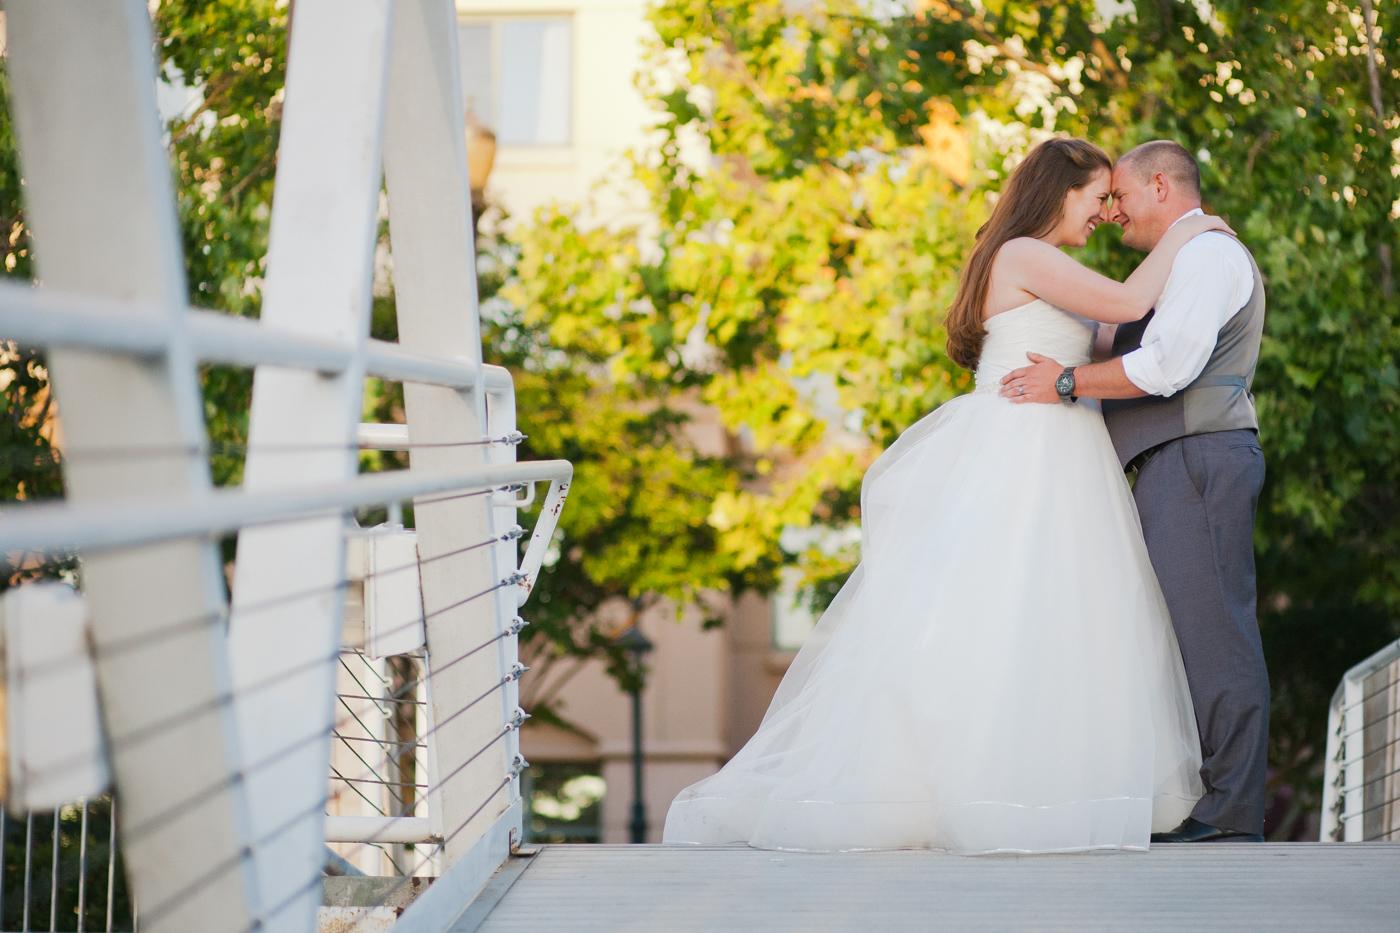 old-sacramento-river-wedding-summer-love-pier-dock-lixxim